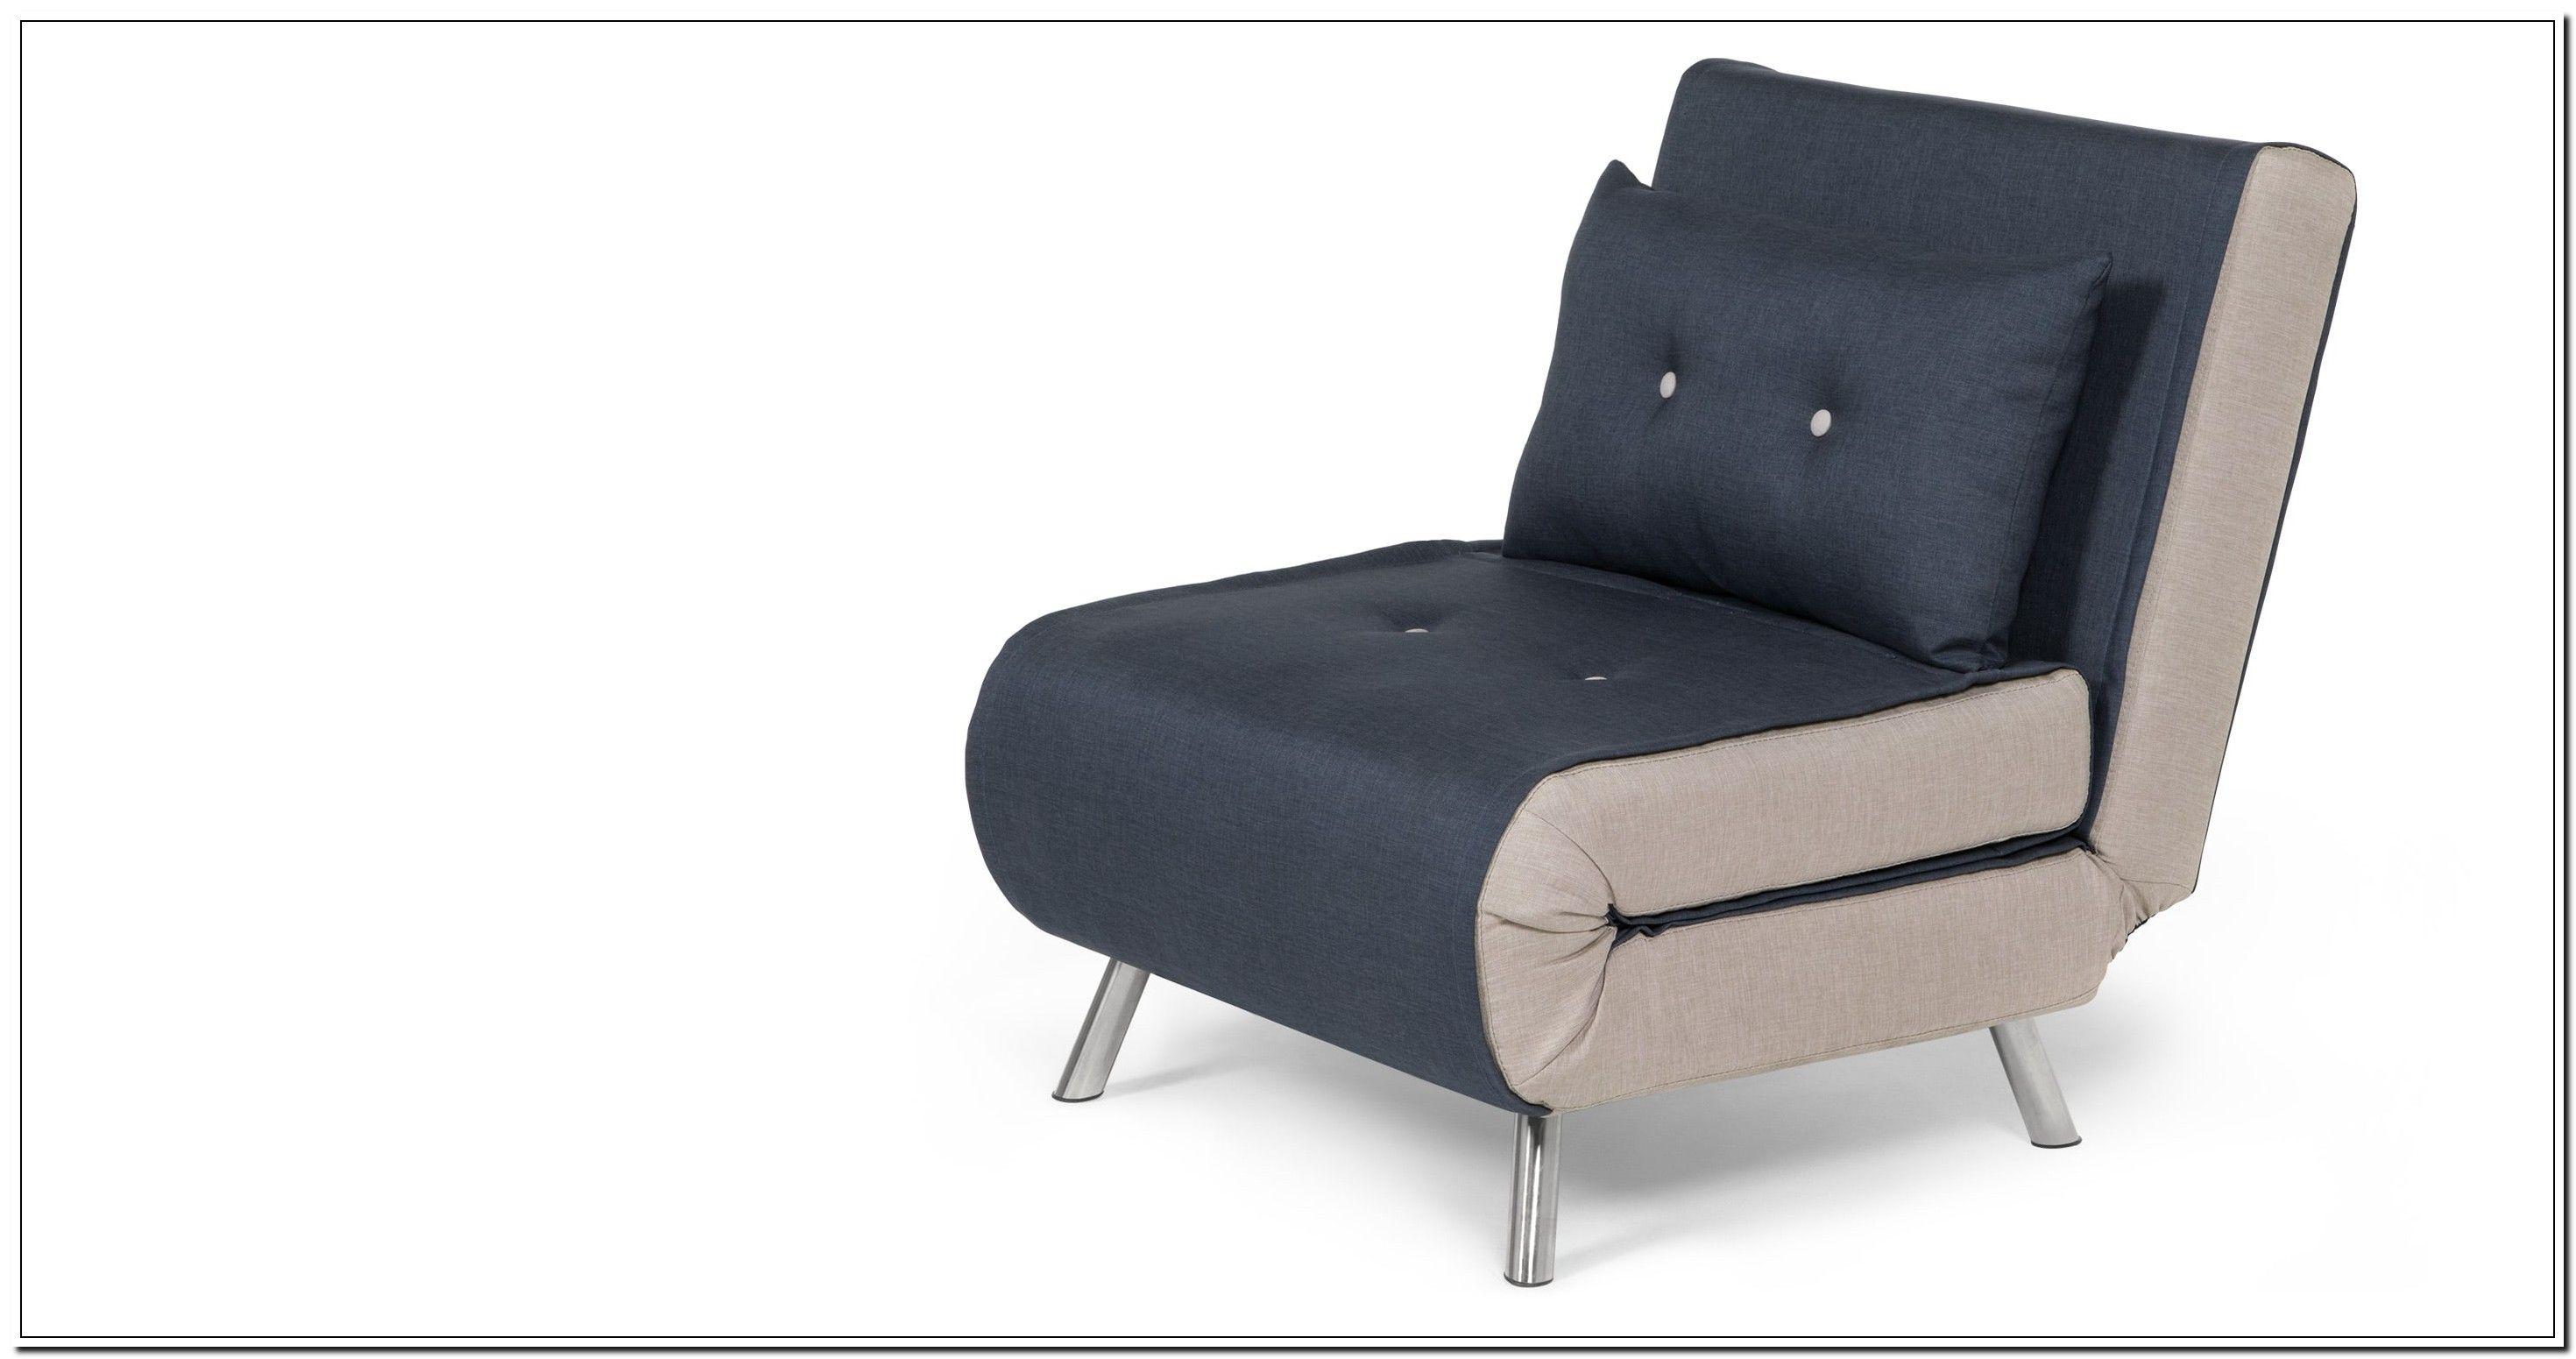 43 Reference Of Single Sofa Bed Chair Single Sofa Bed Single Sofa Bed Chair Single Sofa